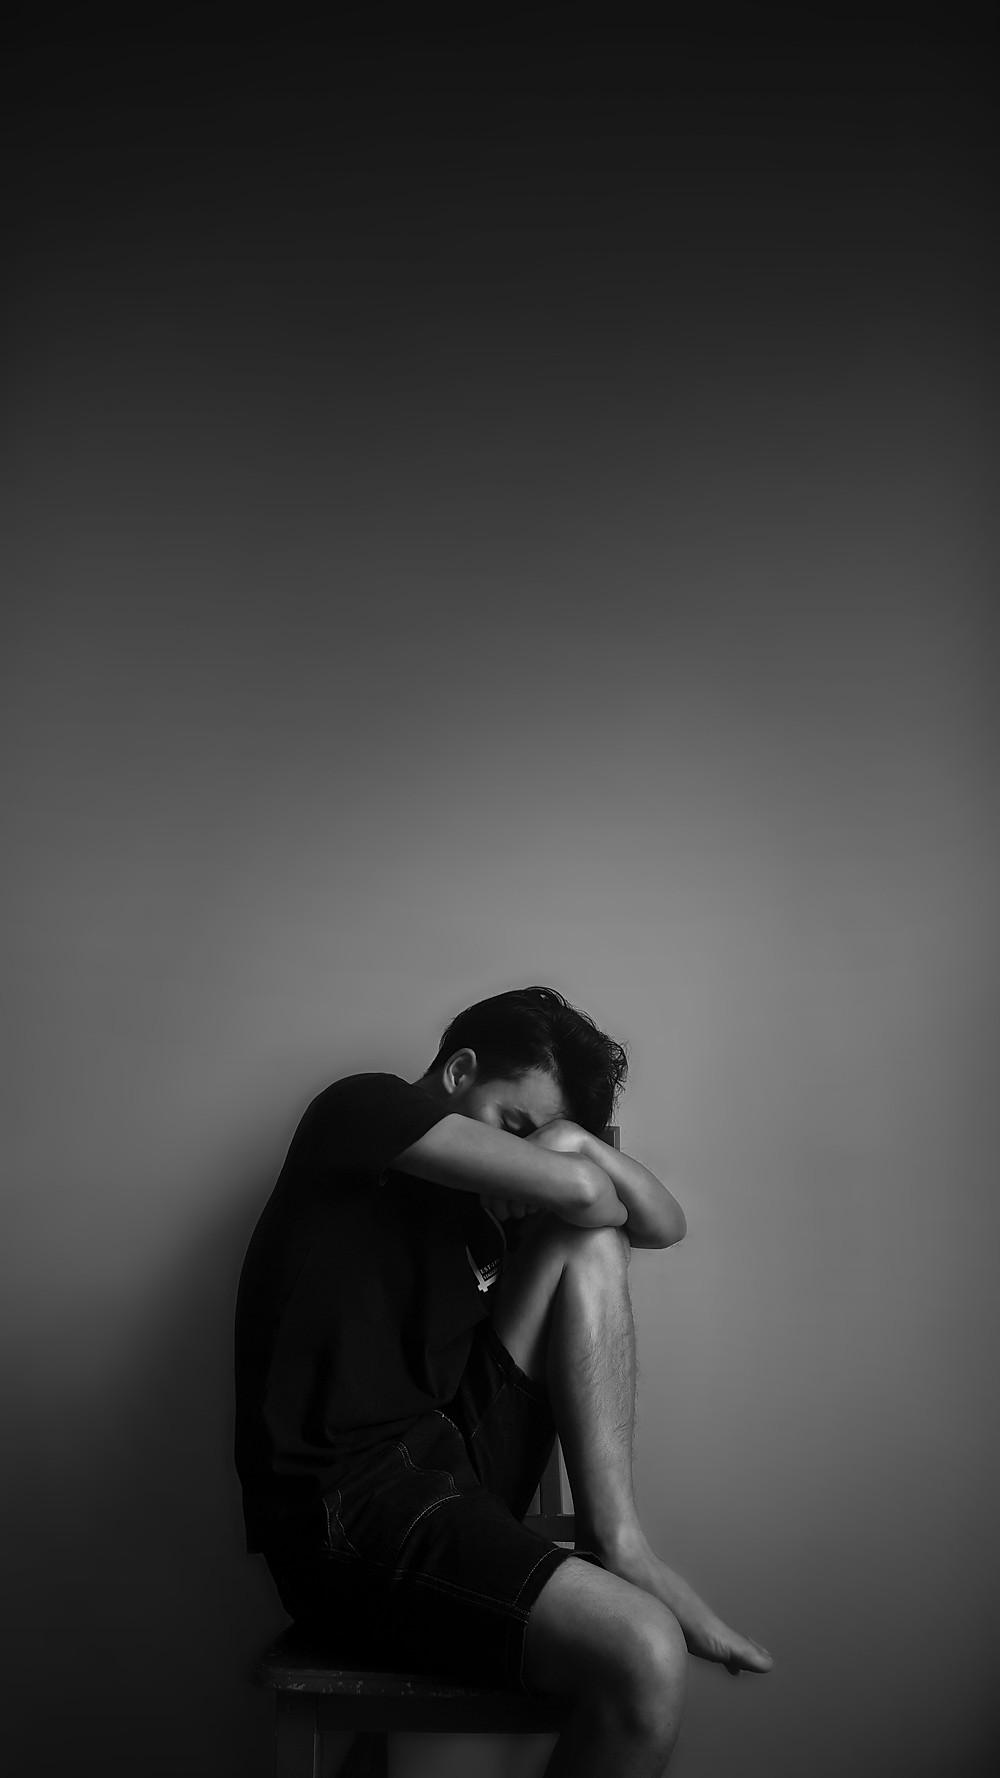 abnormal psychology, mental health, mental illness, depression, clinical psychology